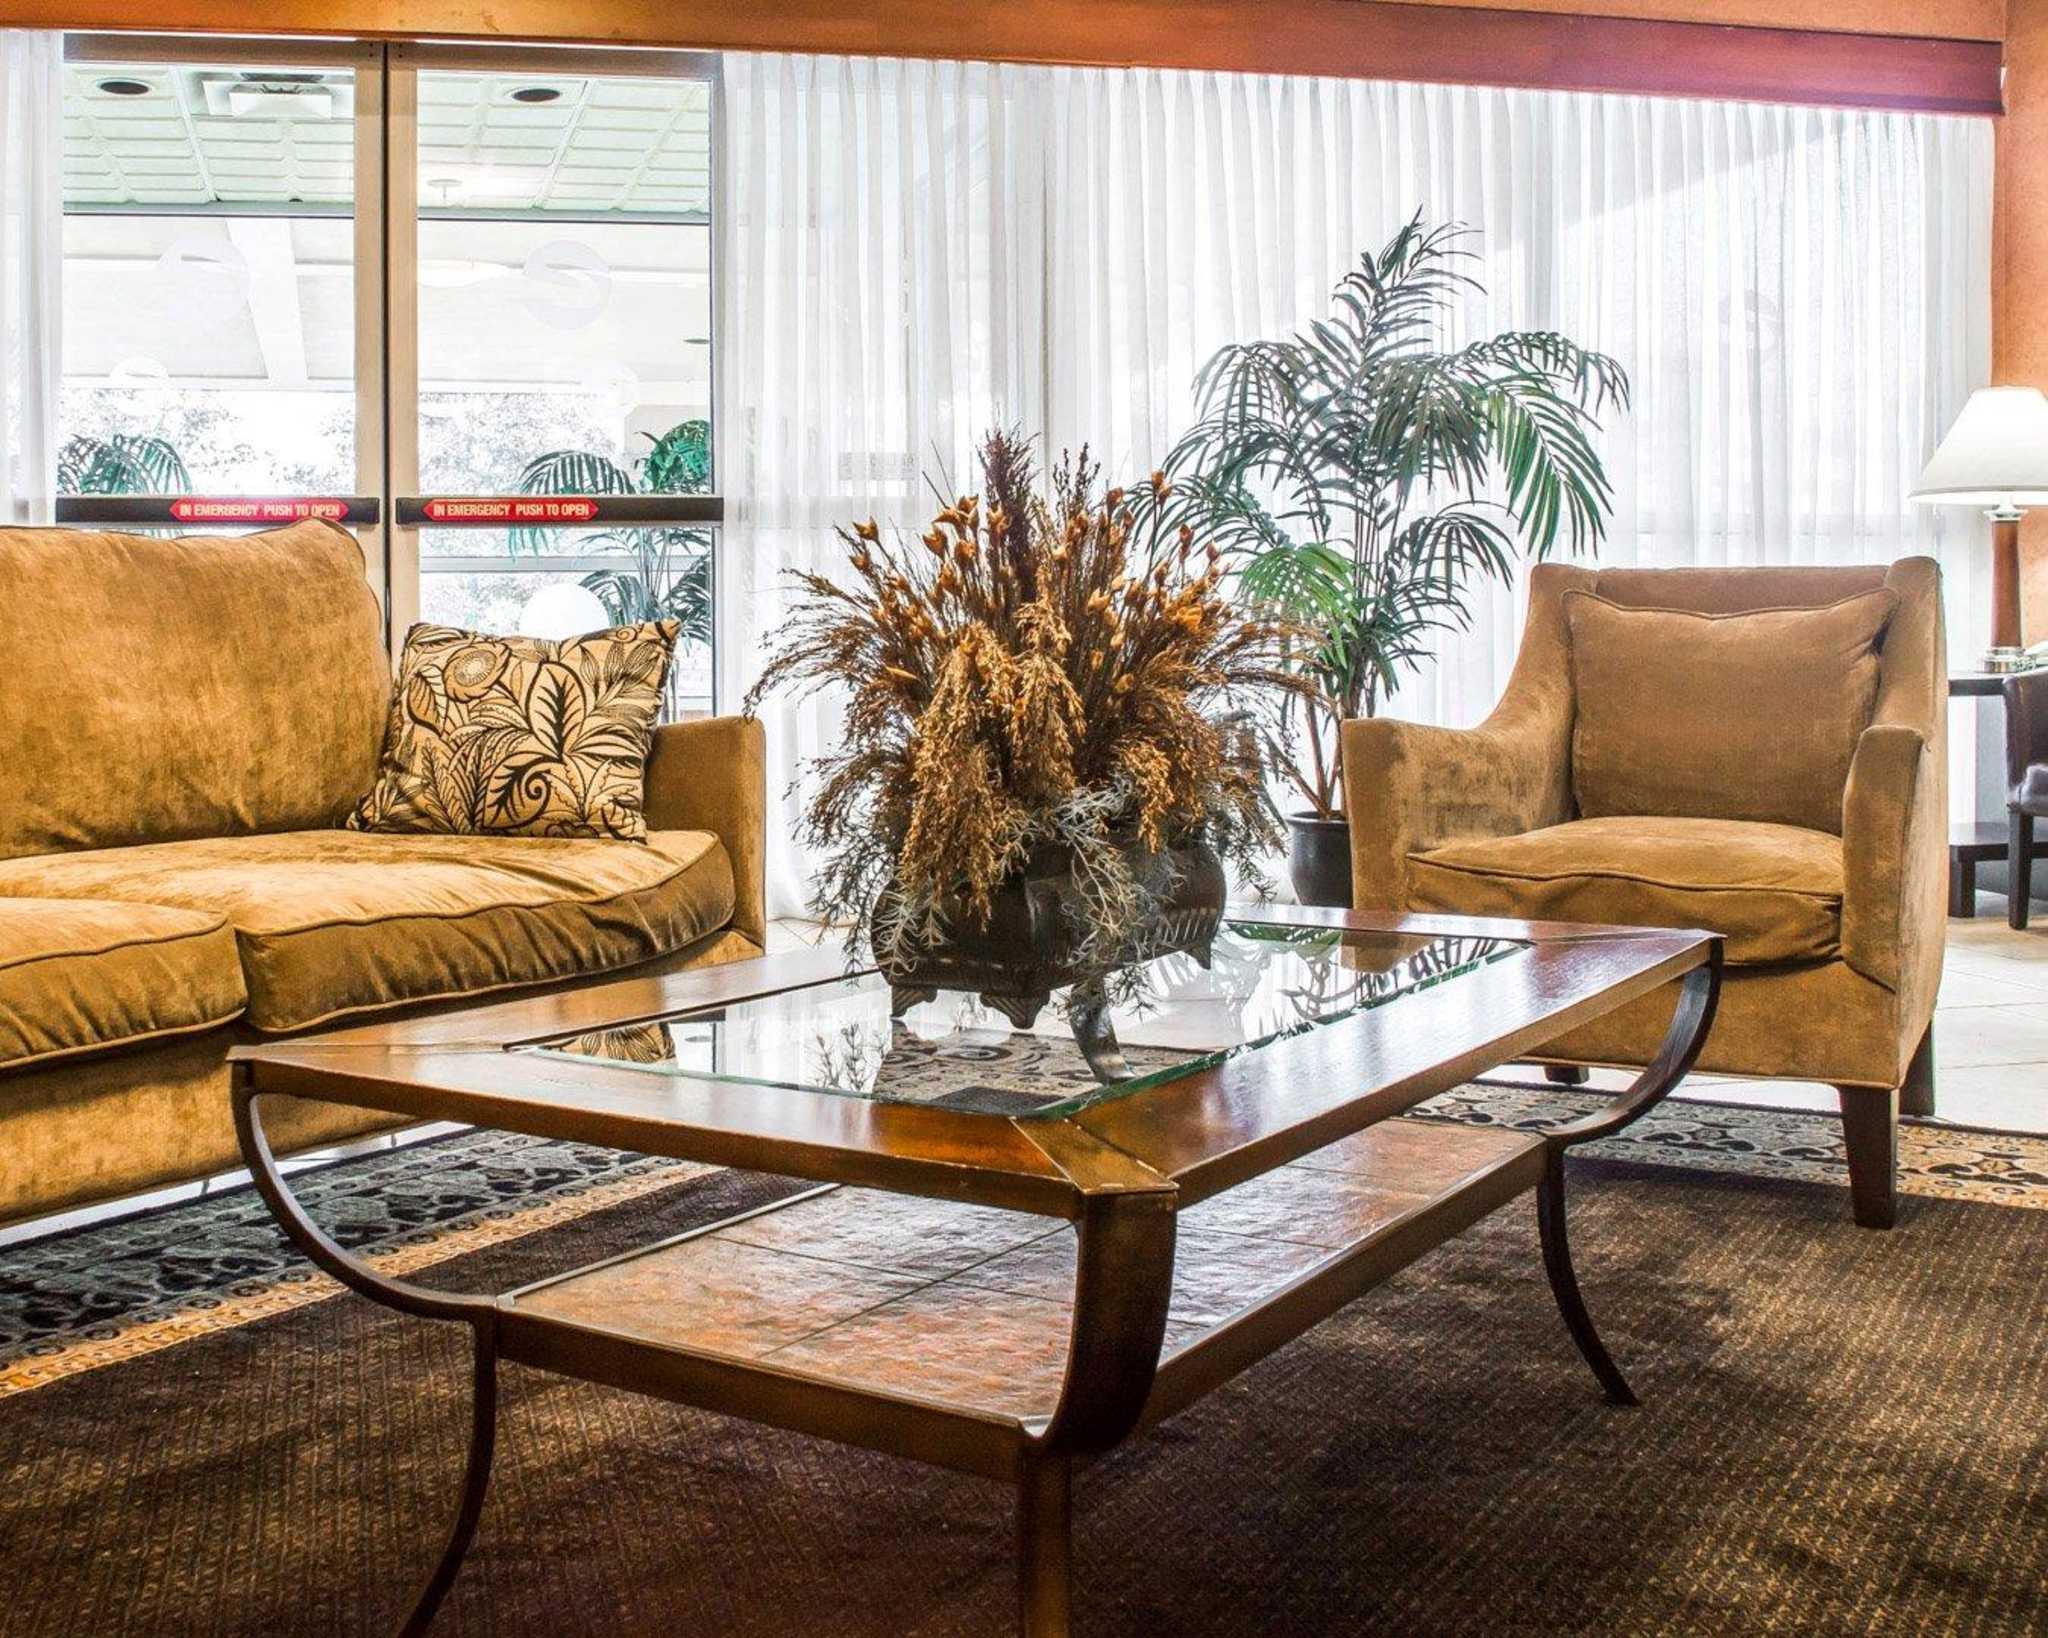 Quality Inn & Suites Fairgrounds image 10